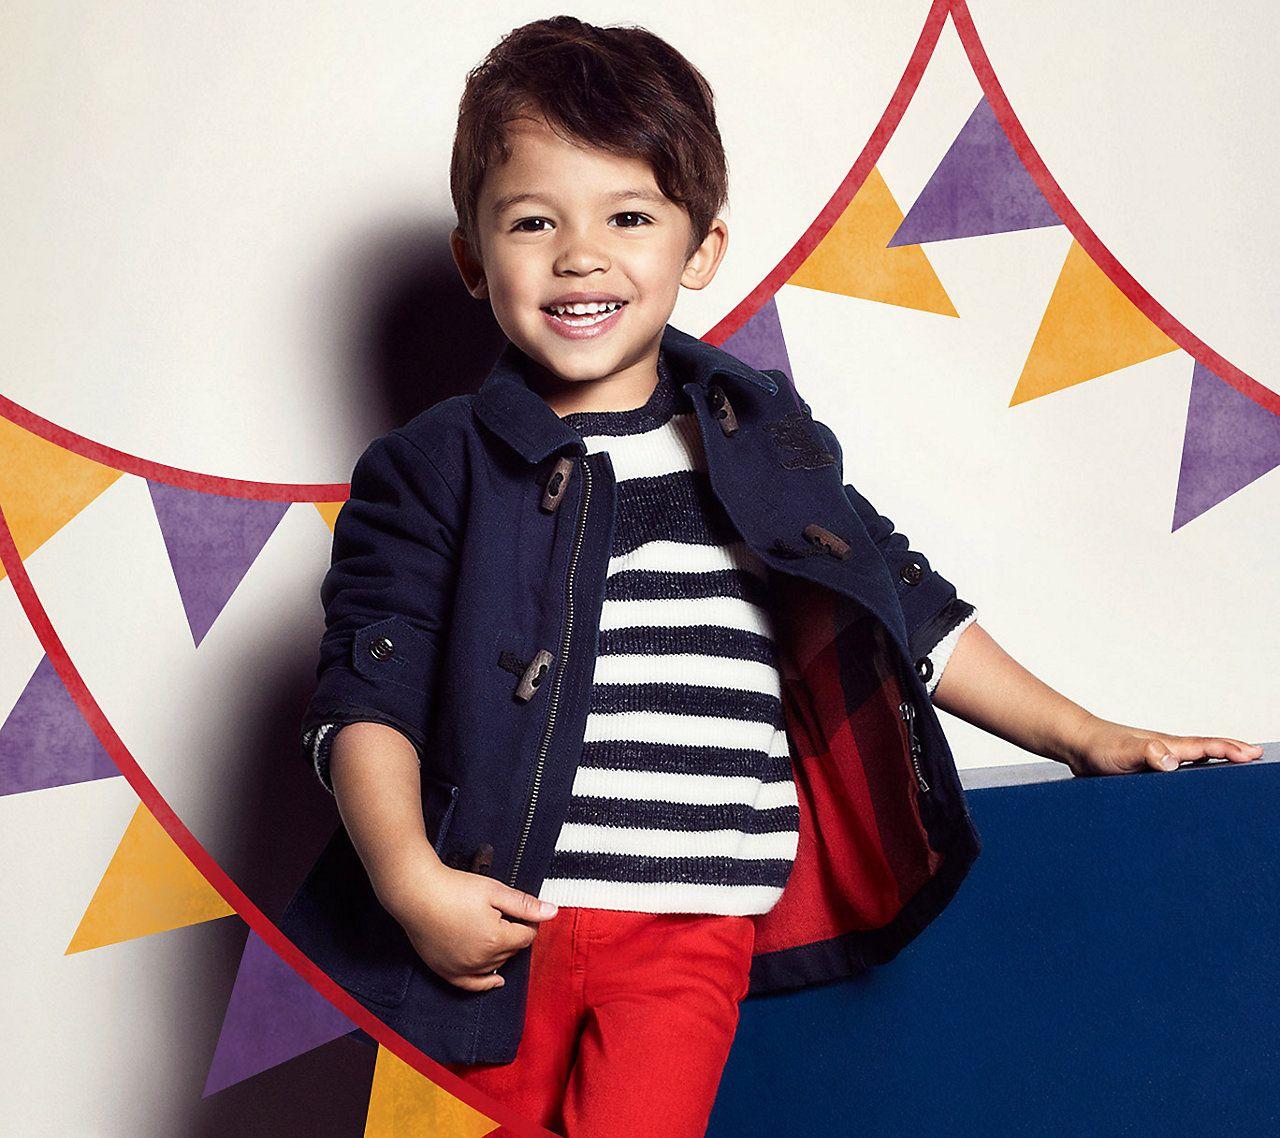 moda infantil ninos 3 anos